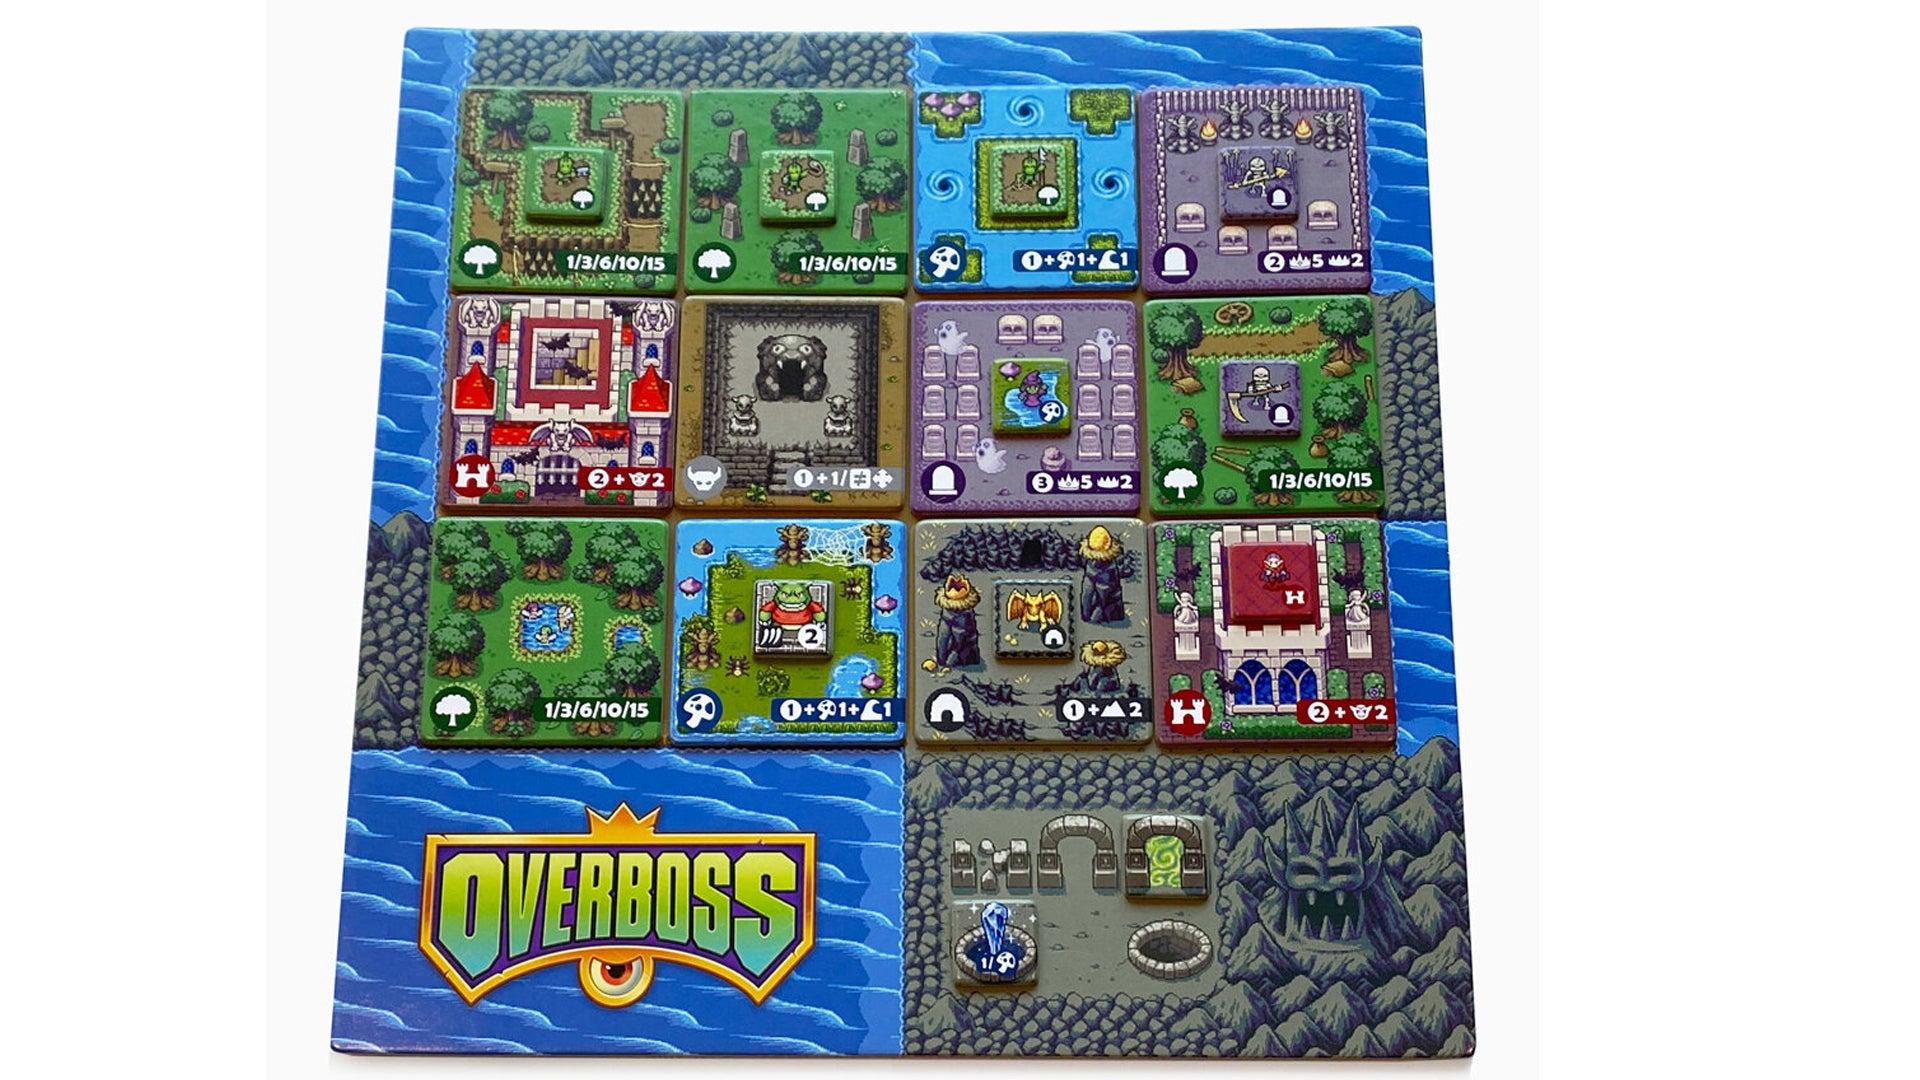 Overboss game board